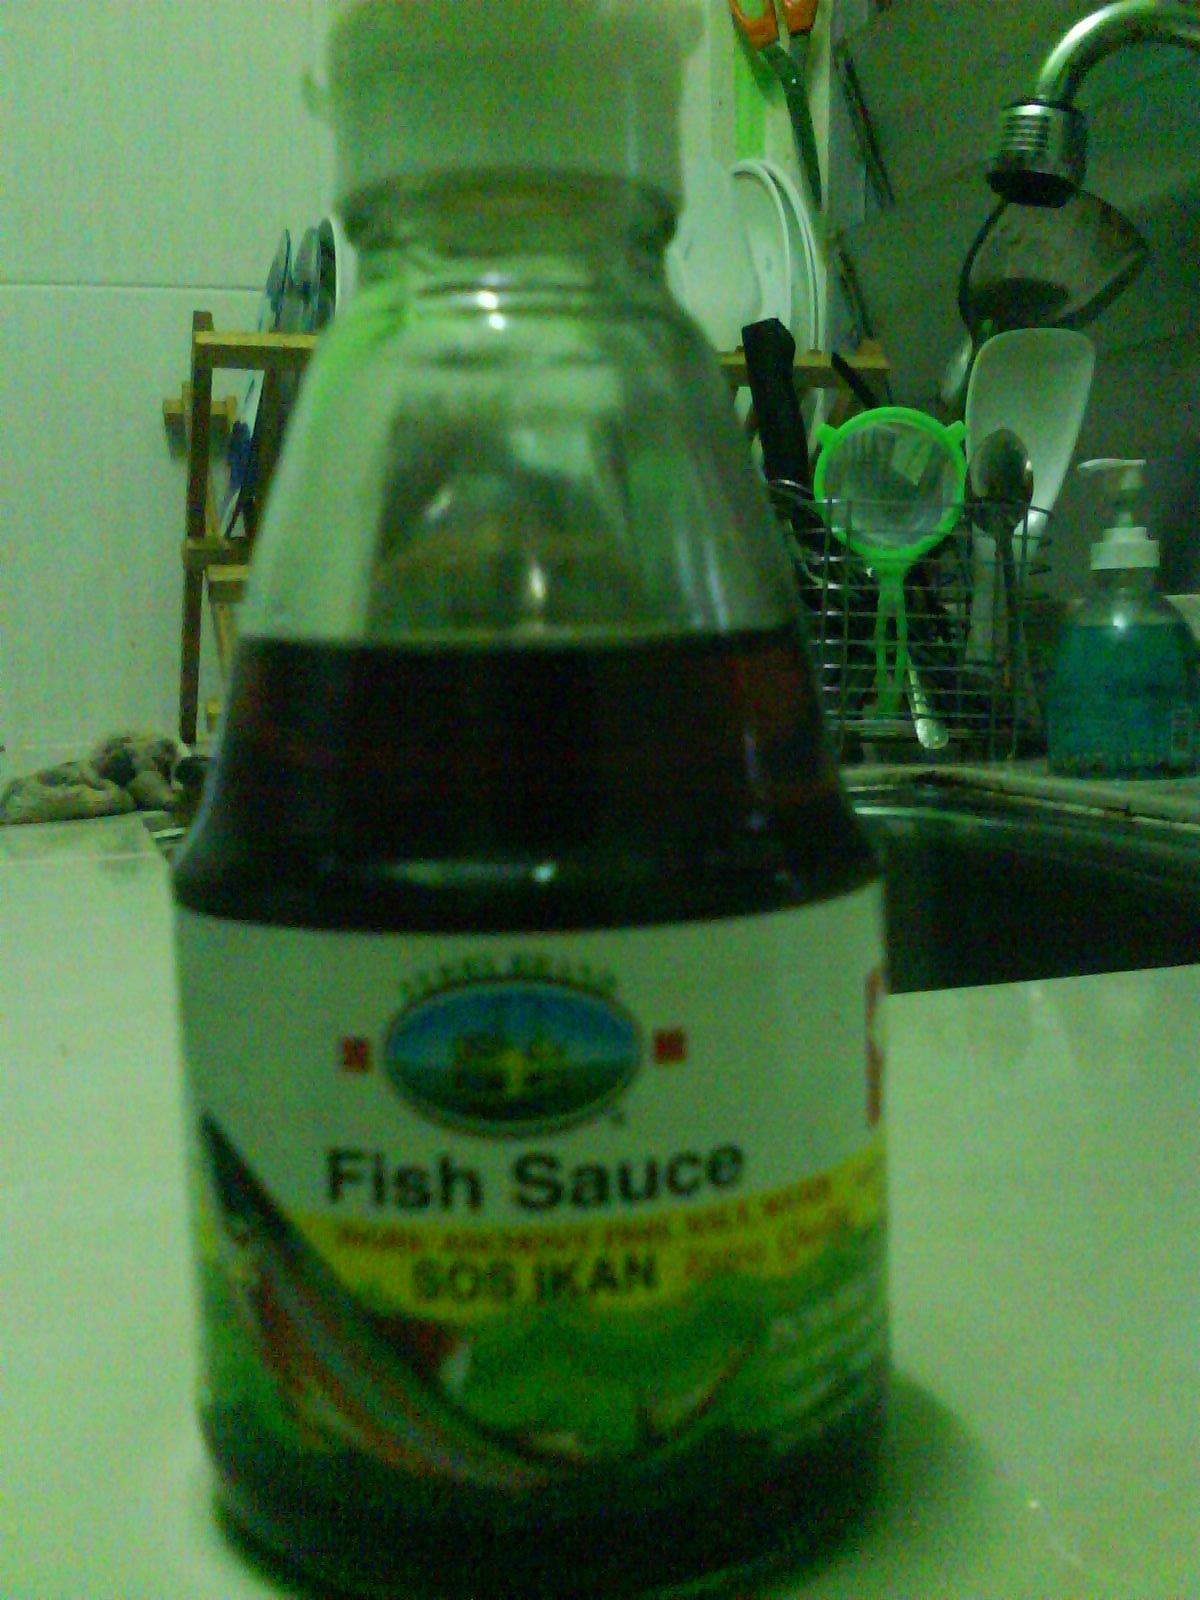 oh  myoliza  oh  sos ikan